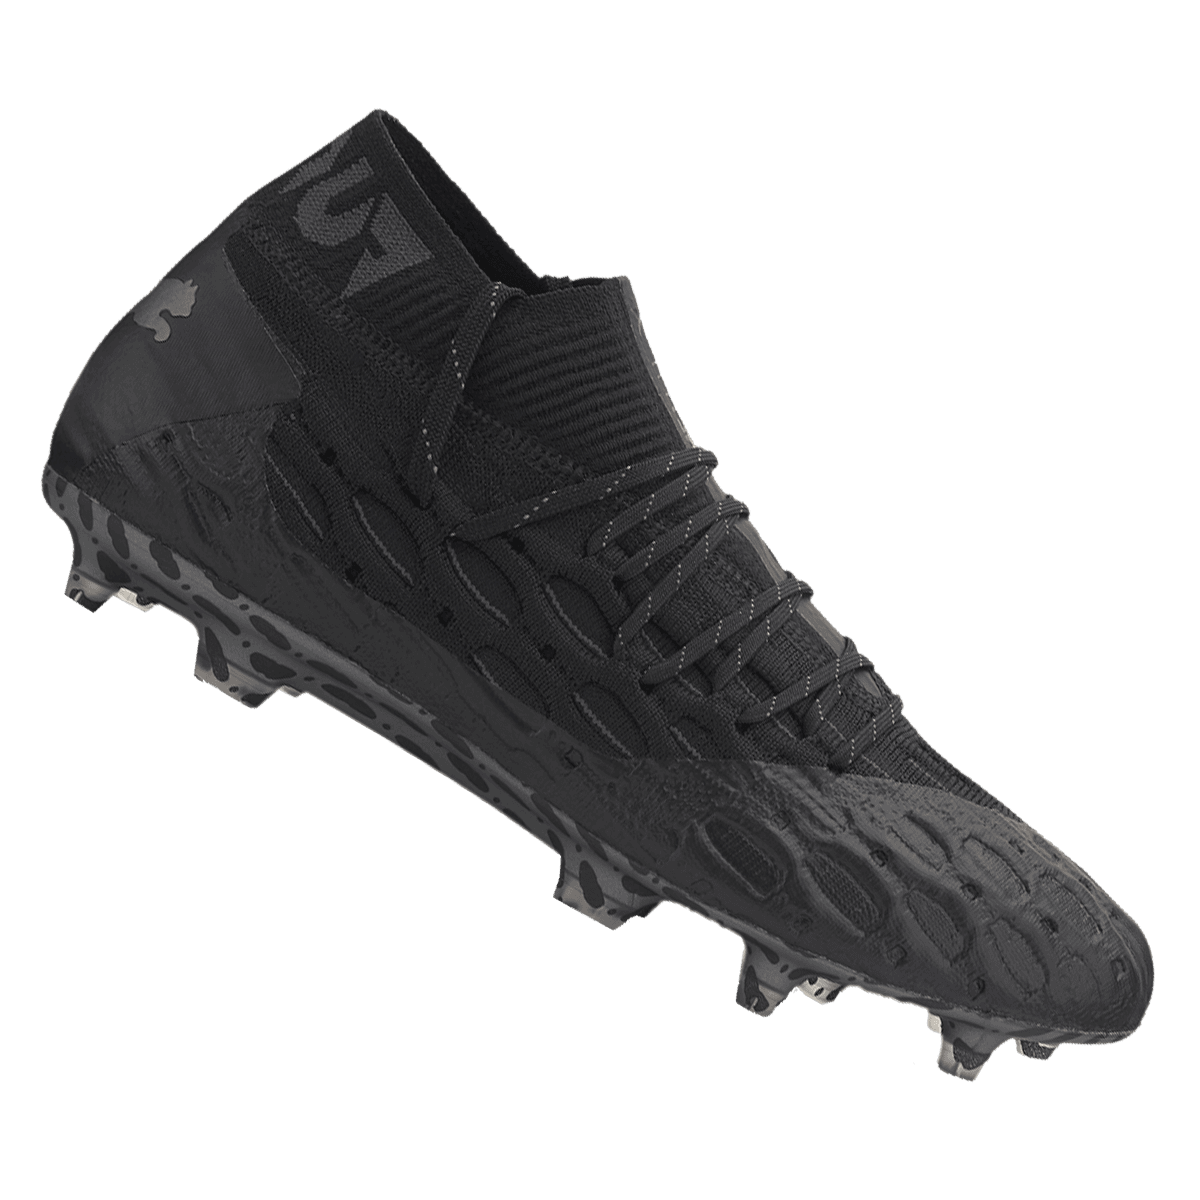 Puma buty piłkarskie Future 5.1 Netfit FGAG czarneantracyt Sklep piłkarski